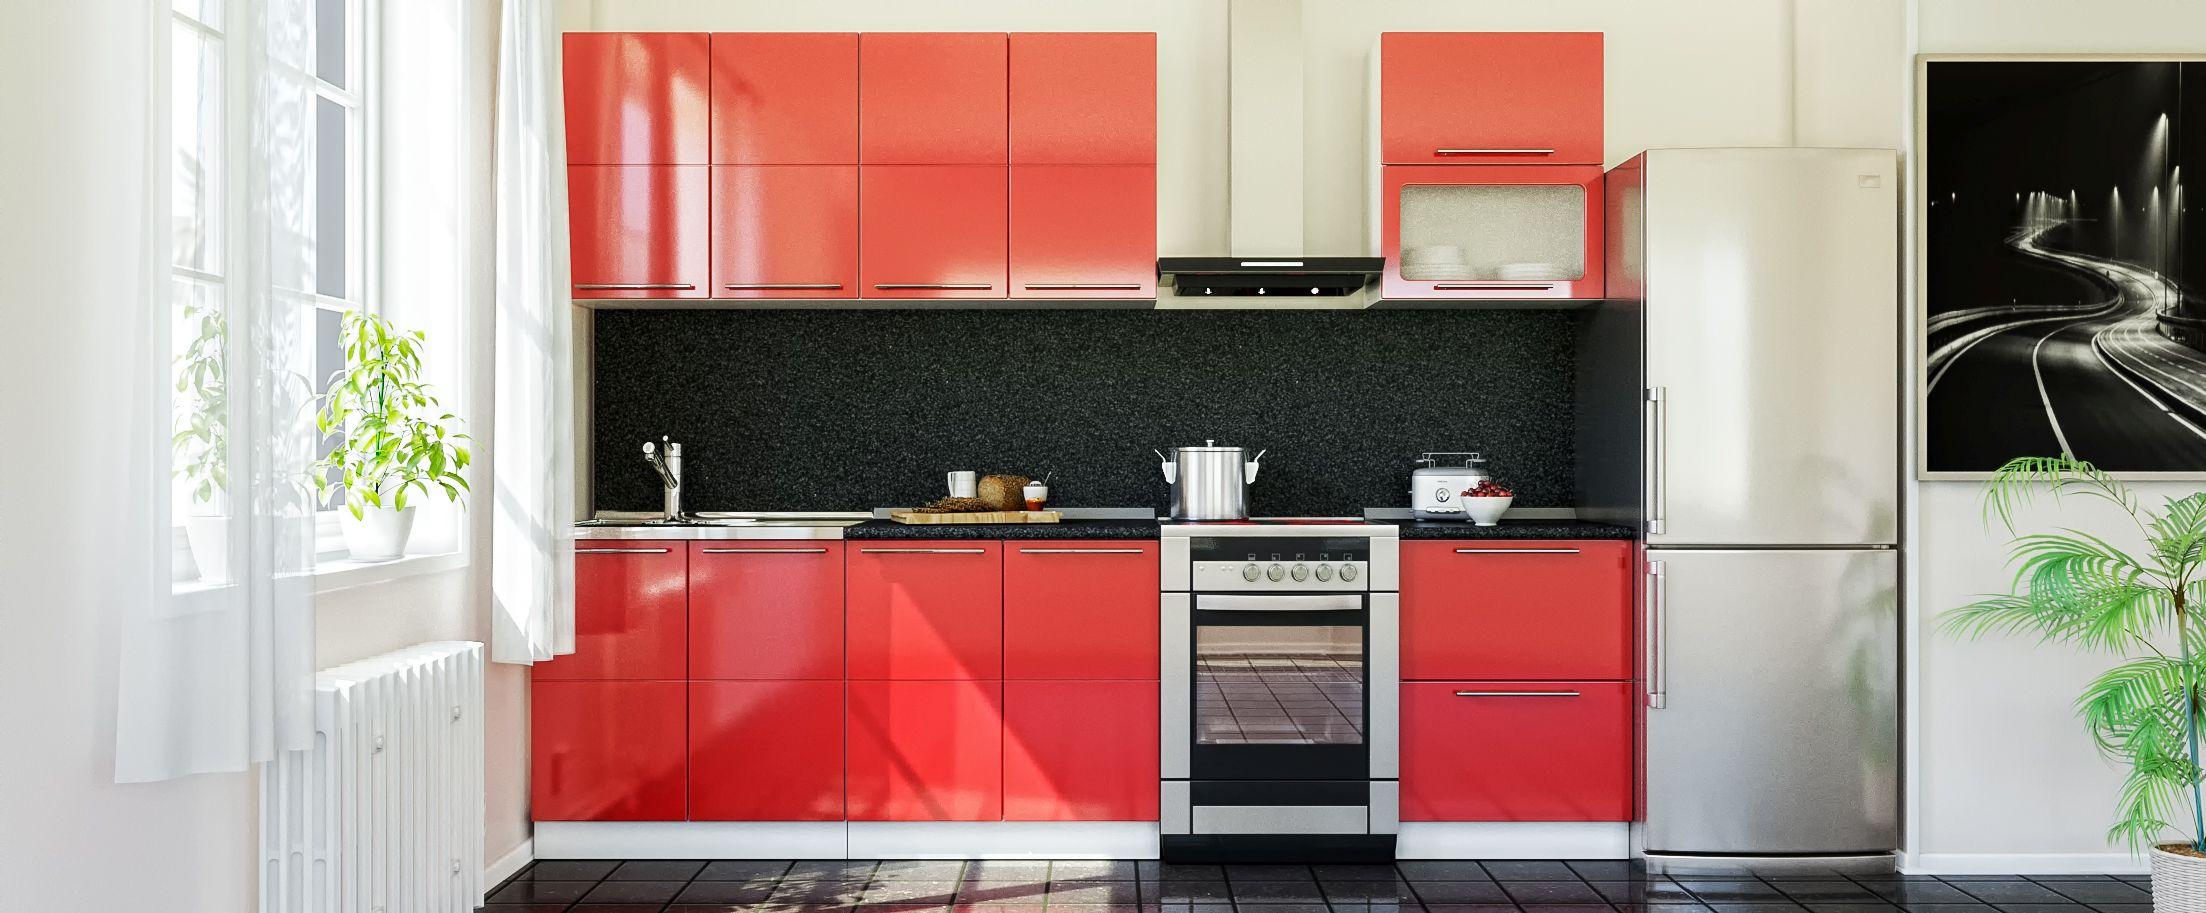 Кухня Красный глянец 2,2 м от MOON TRADE